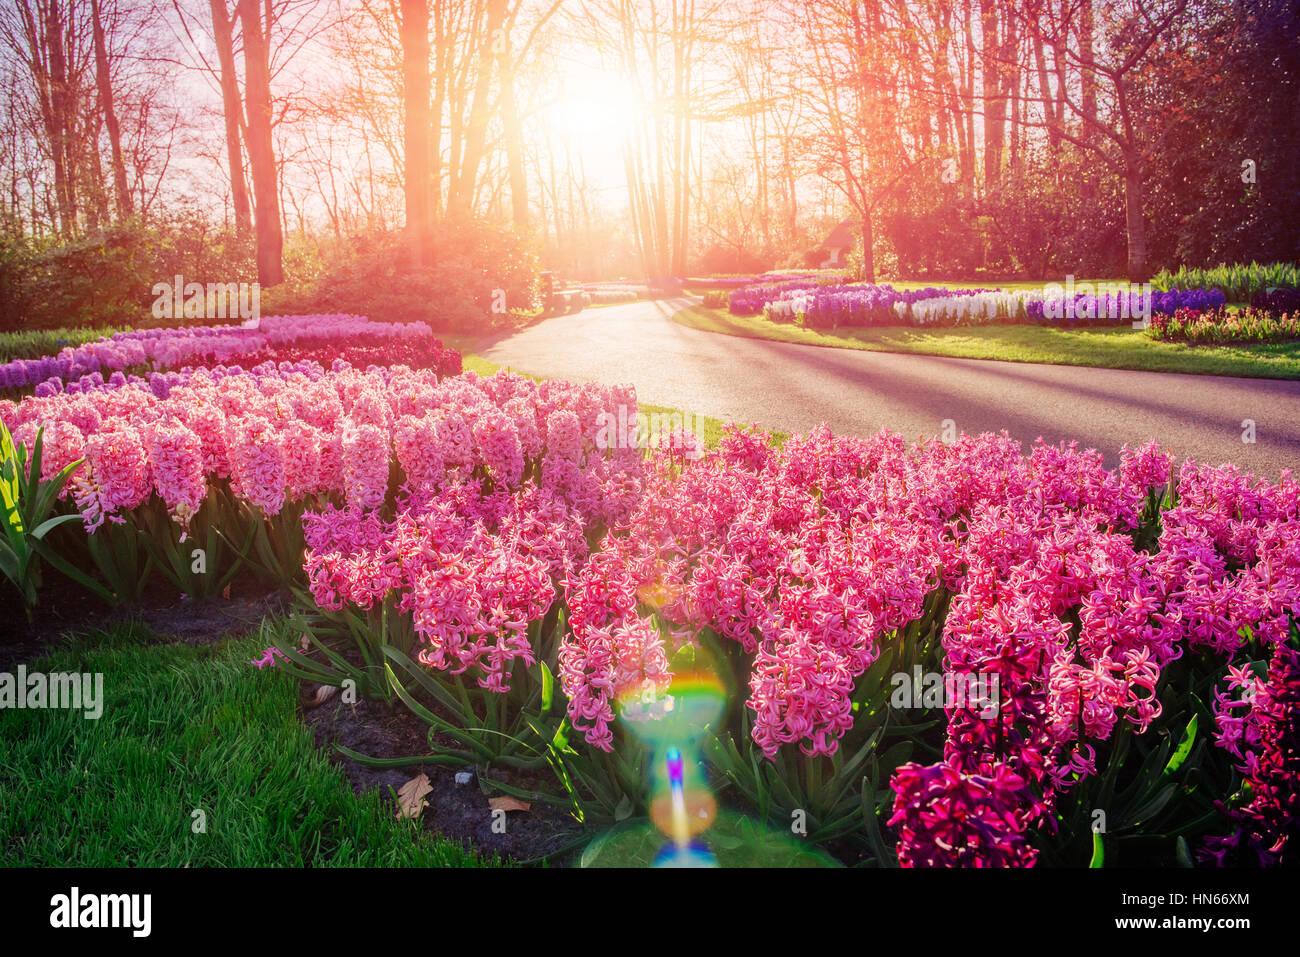 Blume Blumenbeete im Park. Stockbild